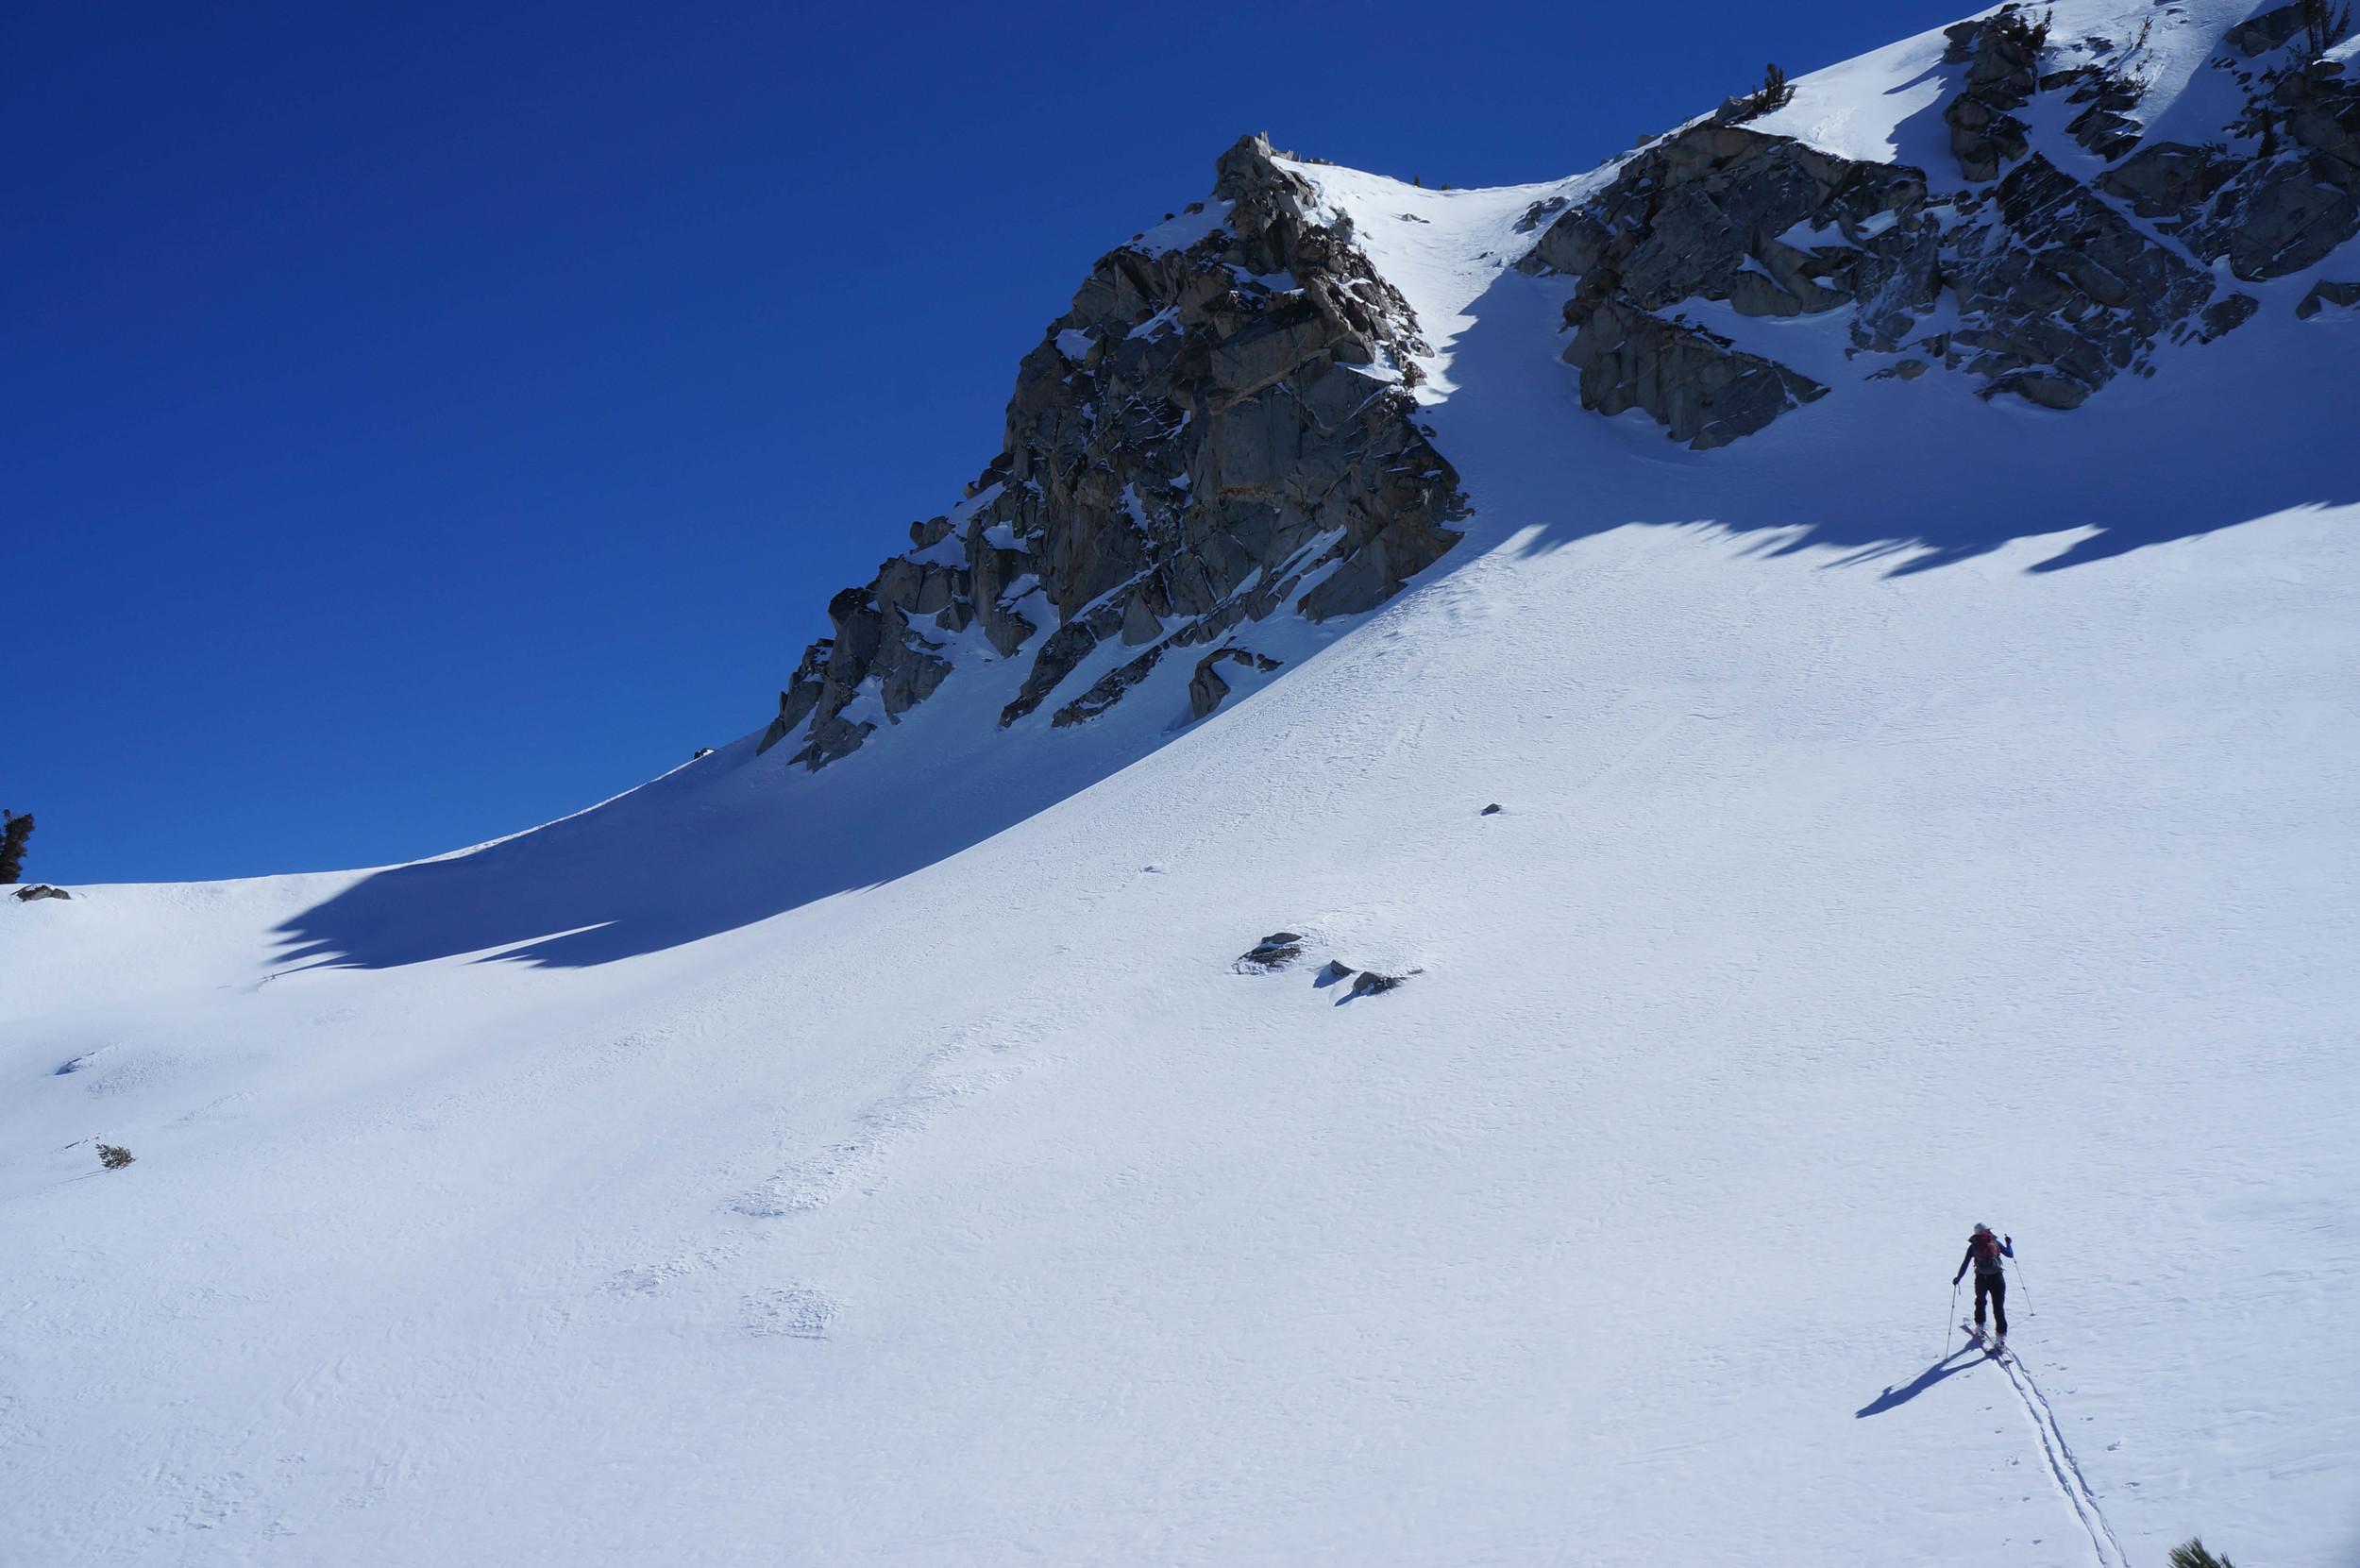 Mammoth backcountry skiing